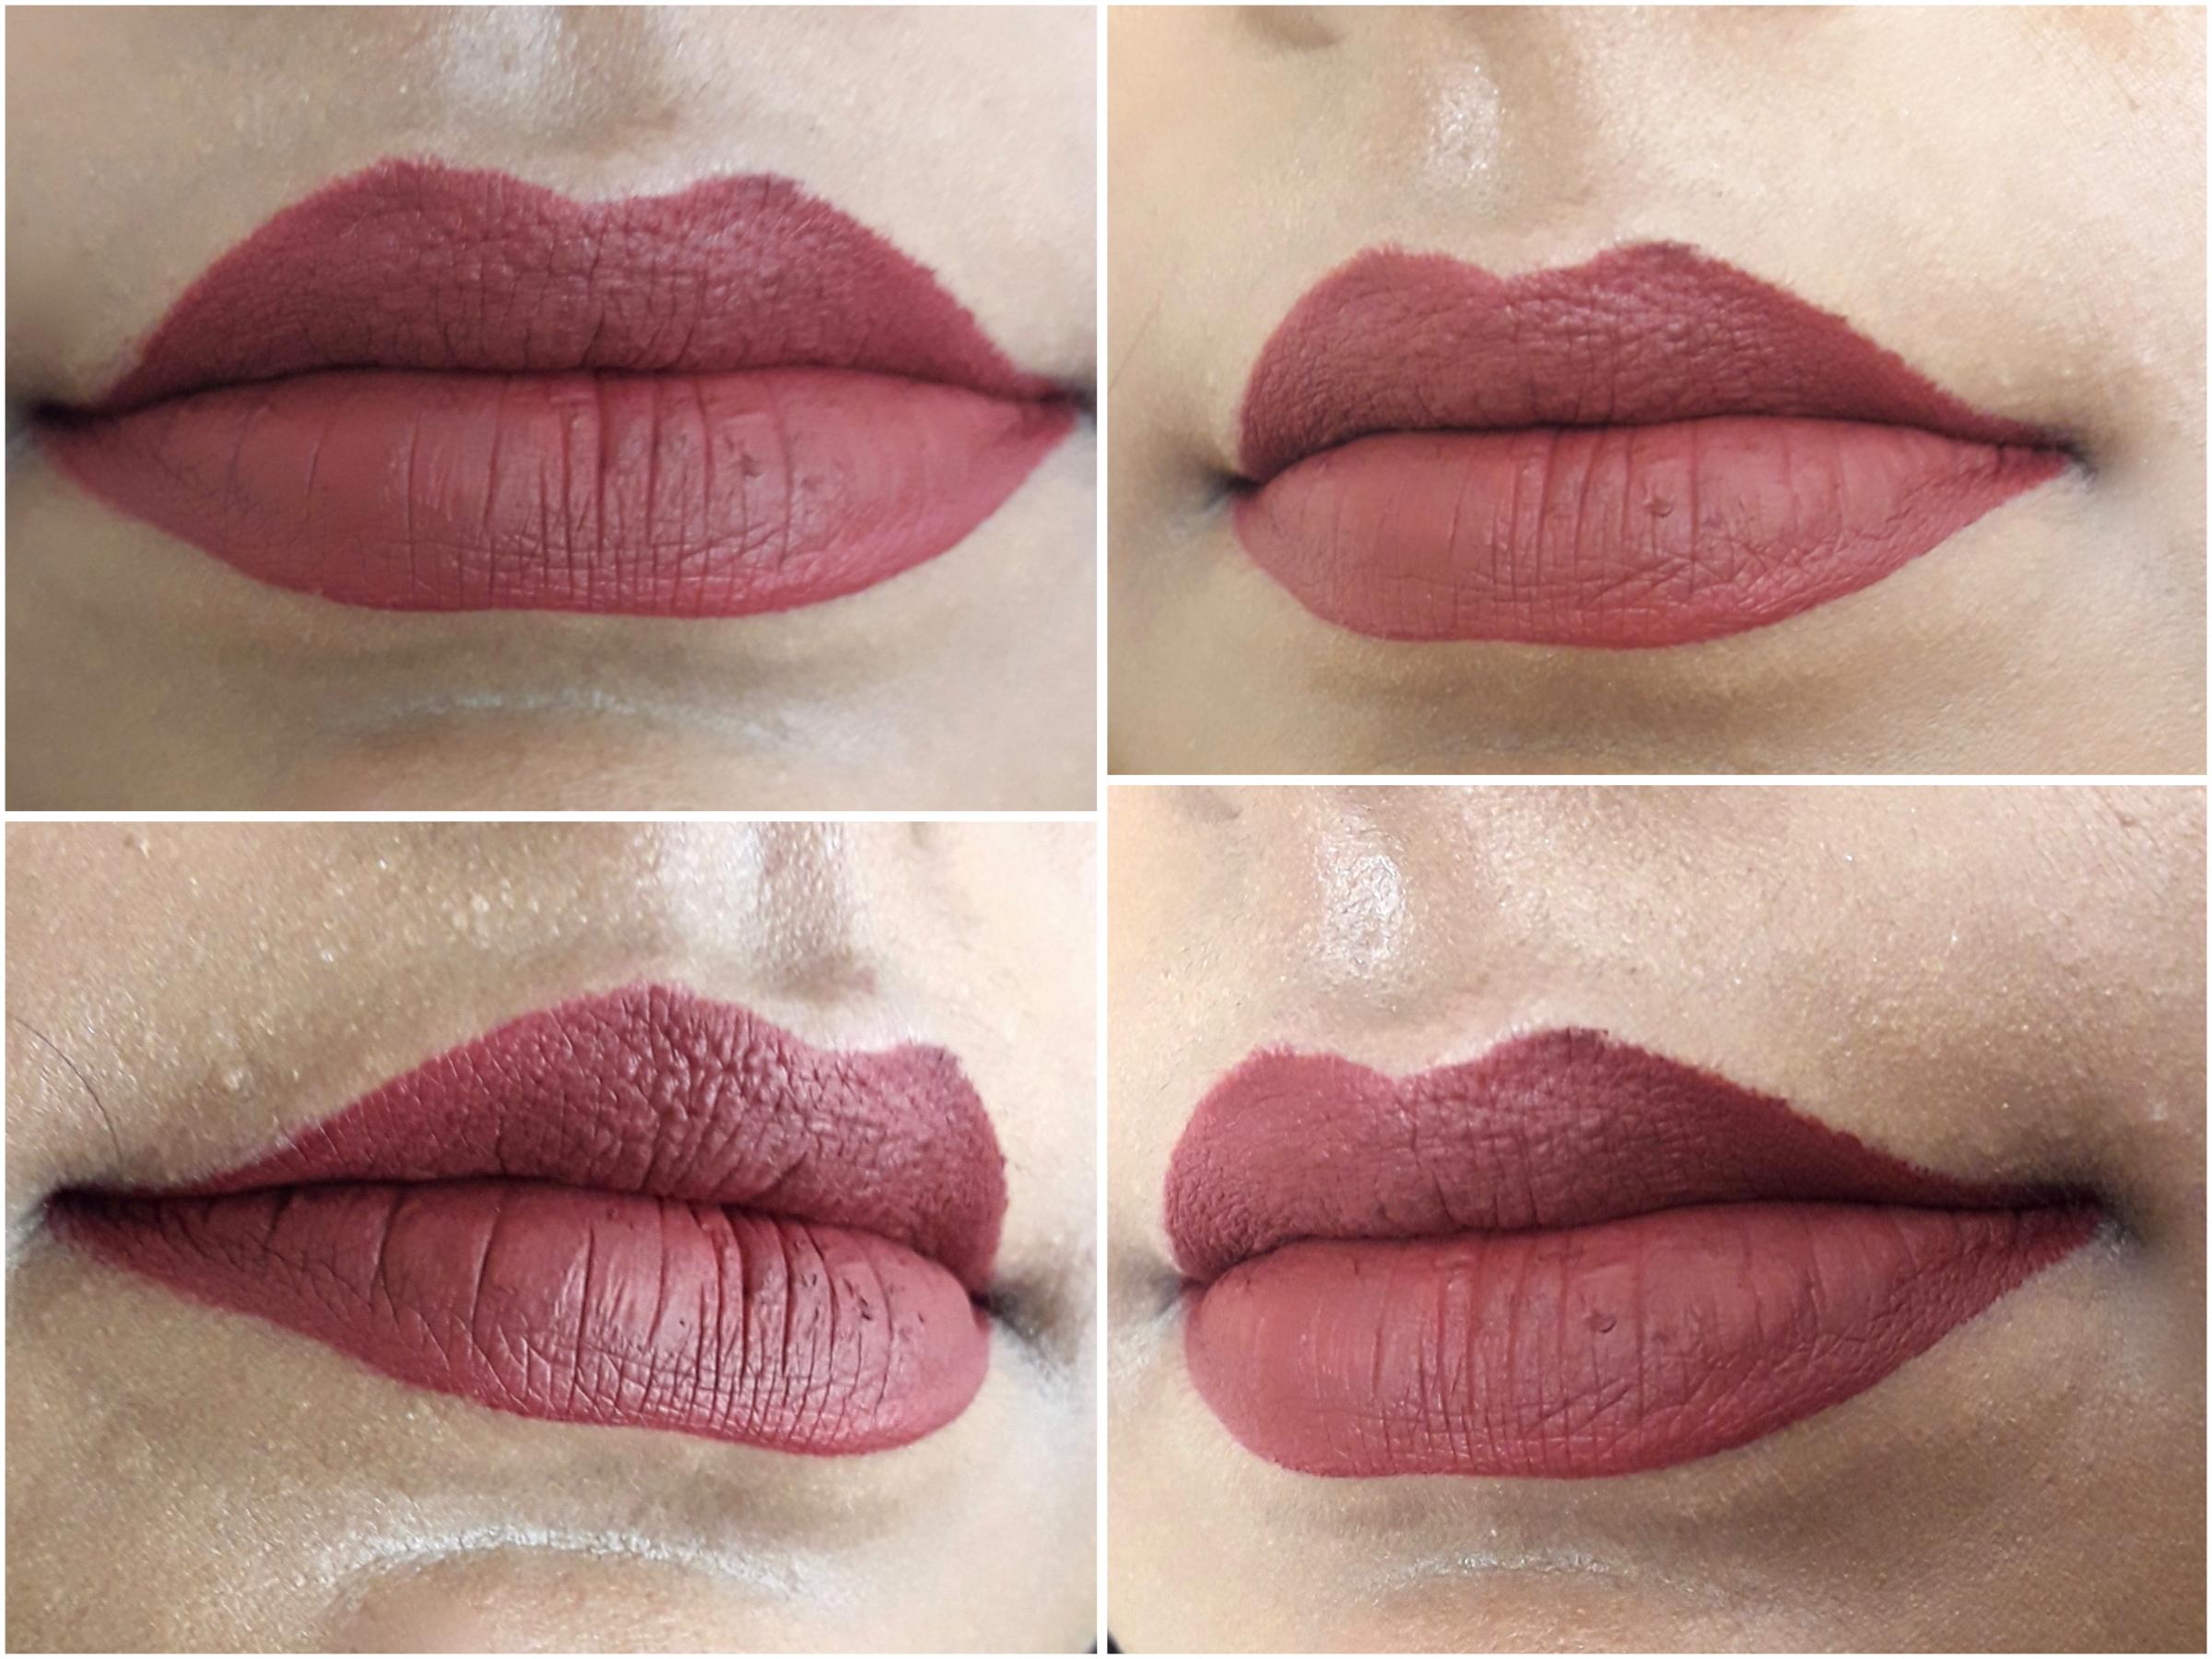 Bh Cosmetics Matte Liquid Lipstick Lust Review Swatches